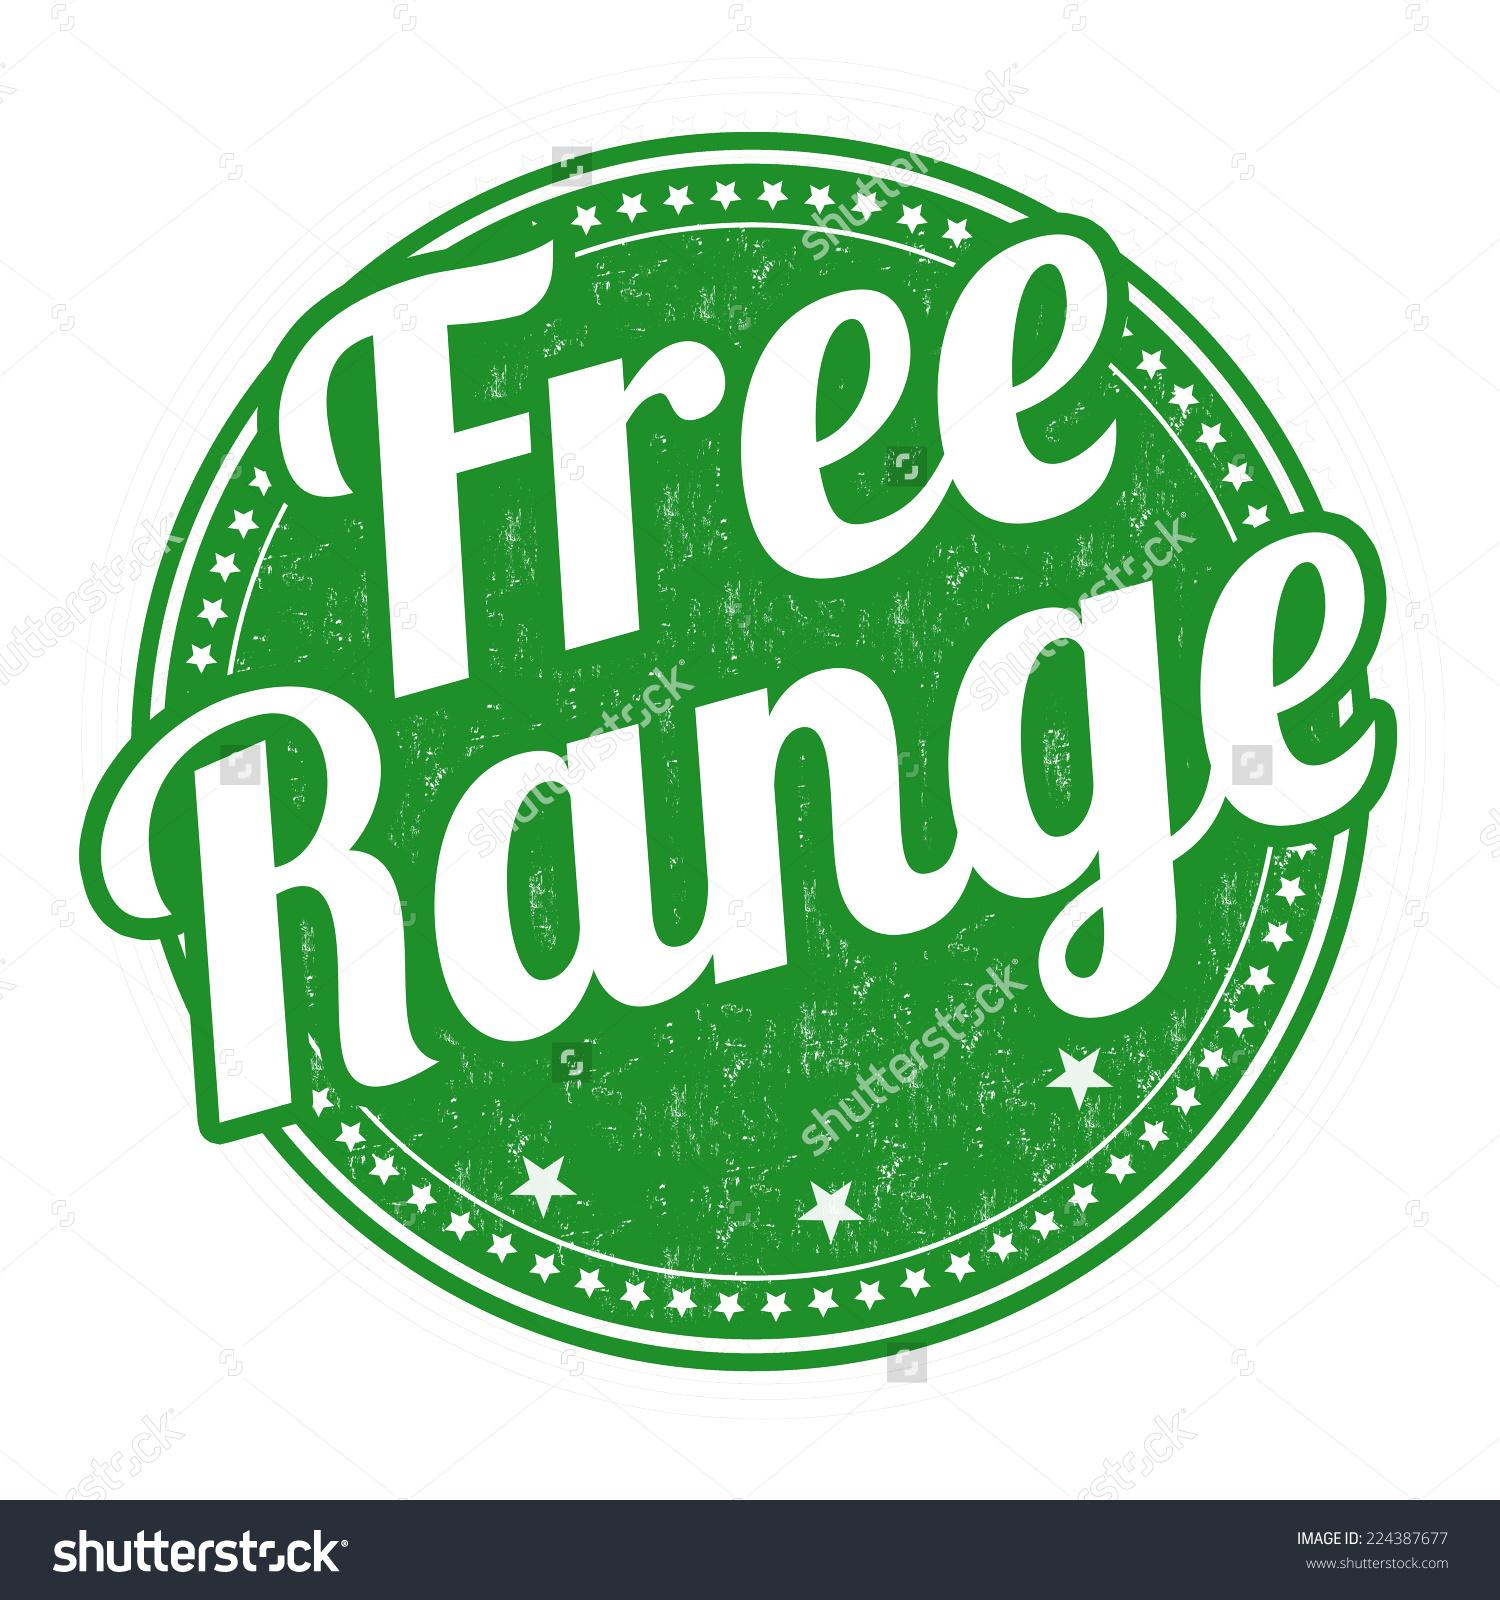 Free Range Grunge Rubber Stamp On Stock Vector 224387677.